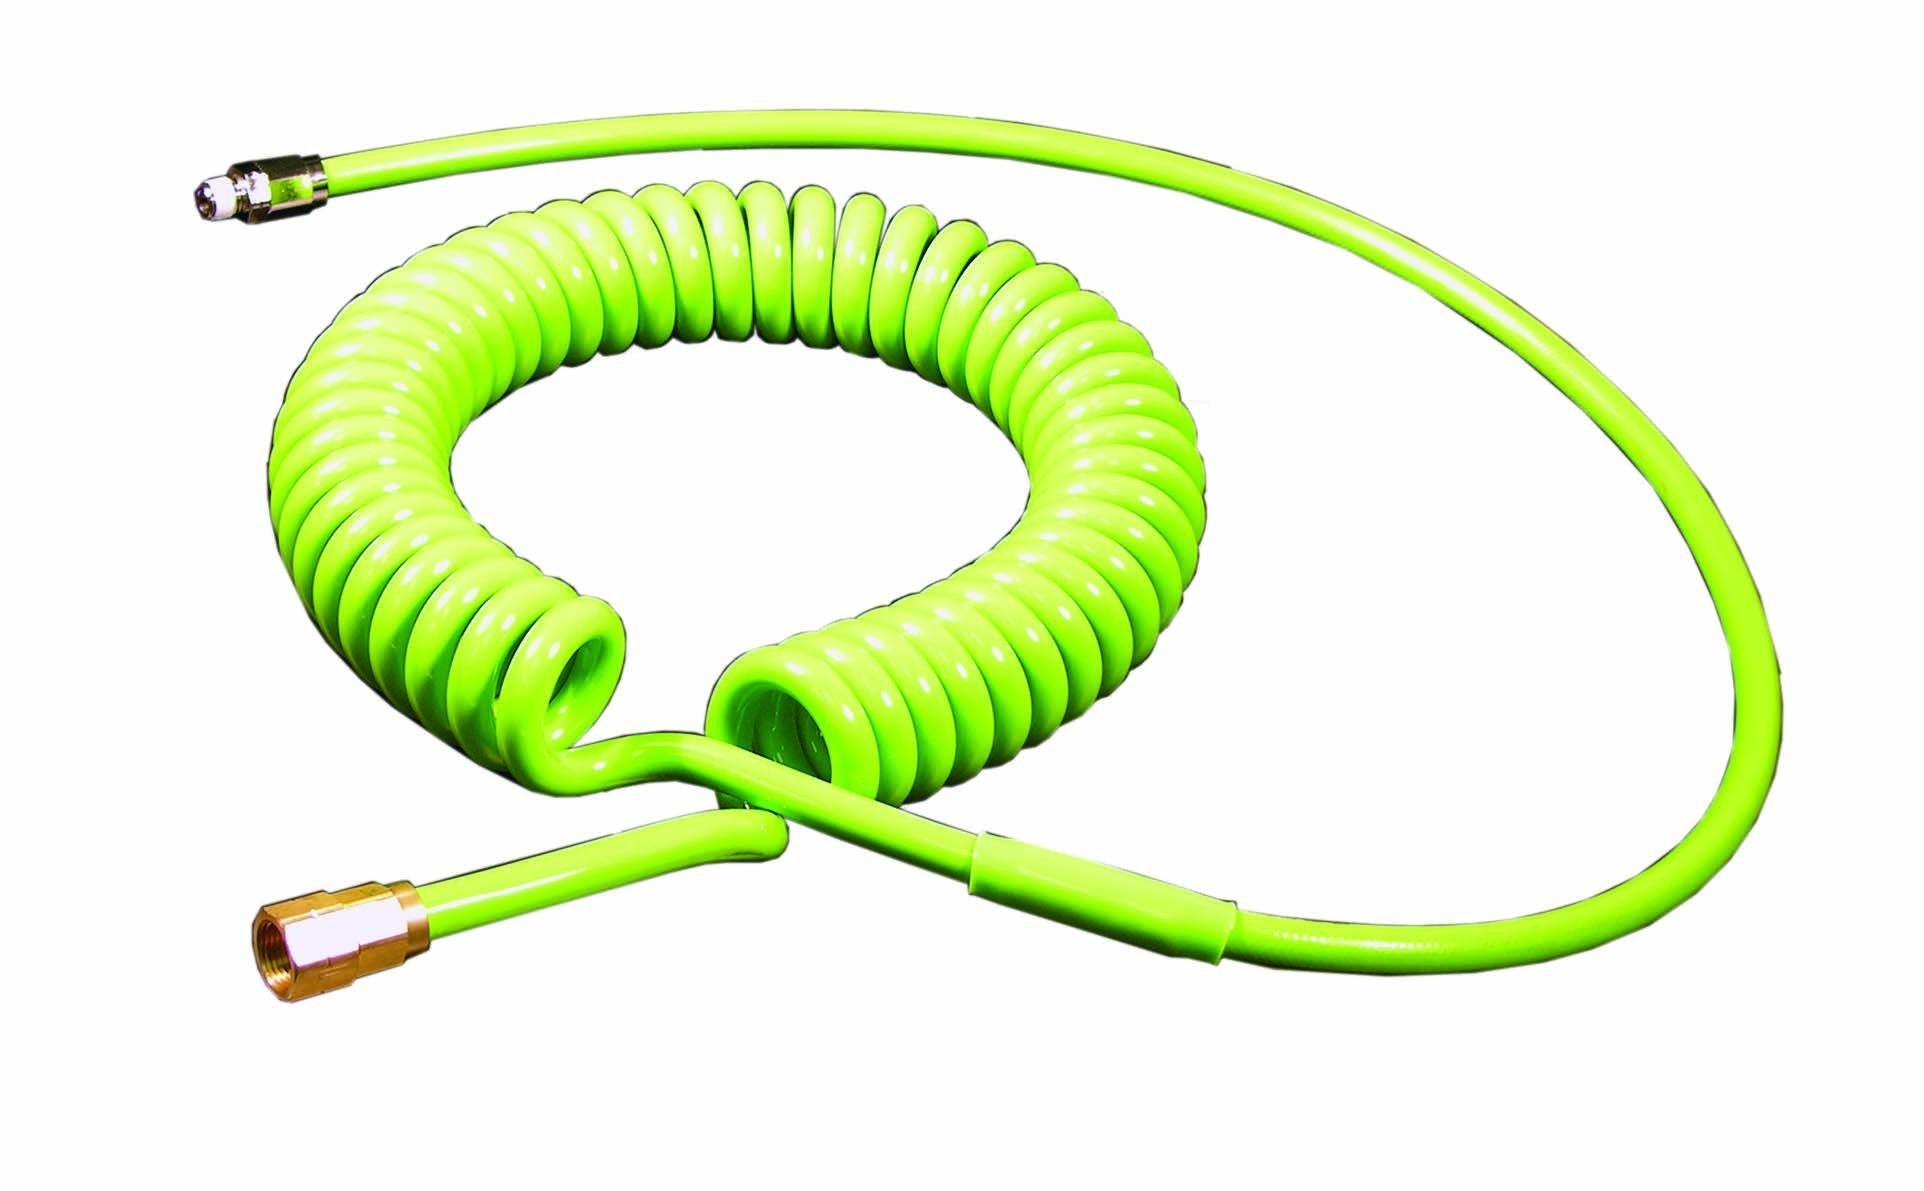 ATP Strong-Plus Polyurethane Spiral Hose, Orange, 13/32'' ID x 5/8'' OD, 20 feet Length/16 feet Working Length, 1/2'' NPT Male